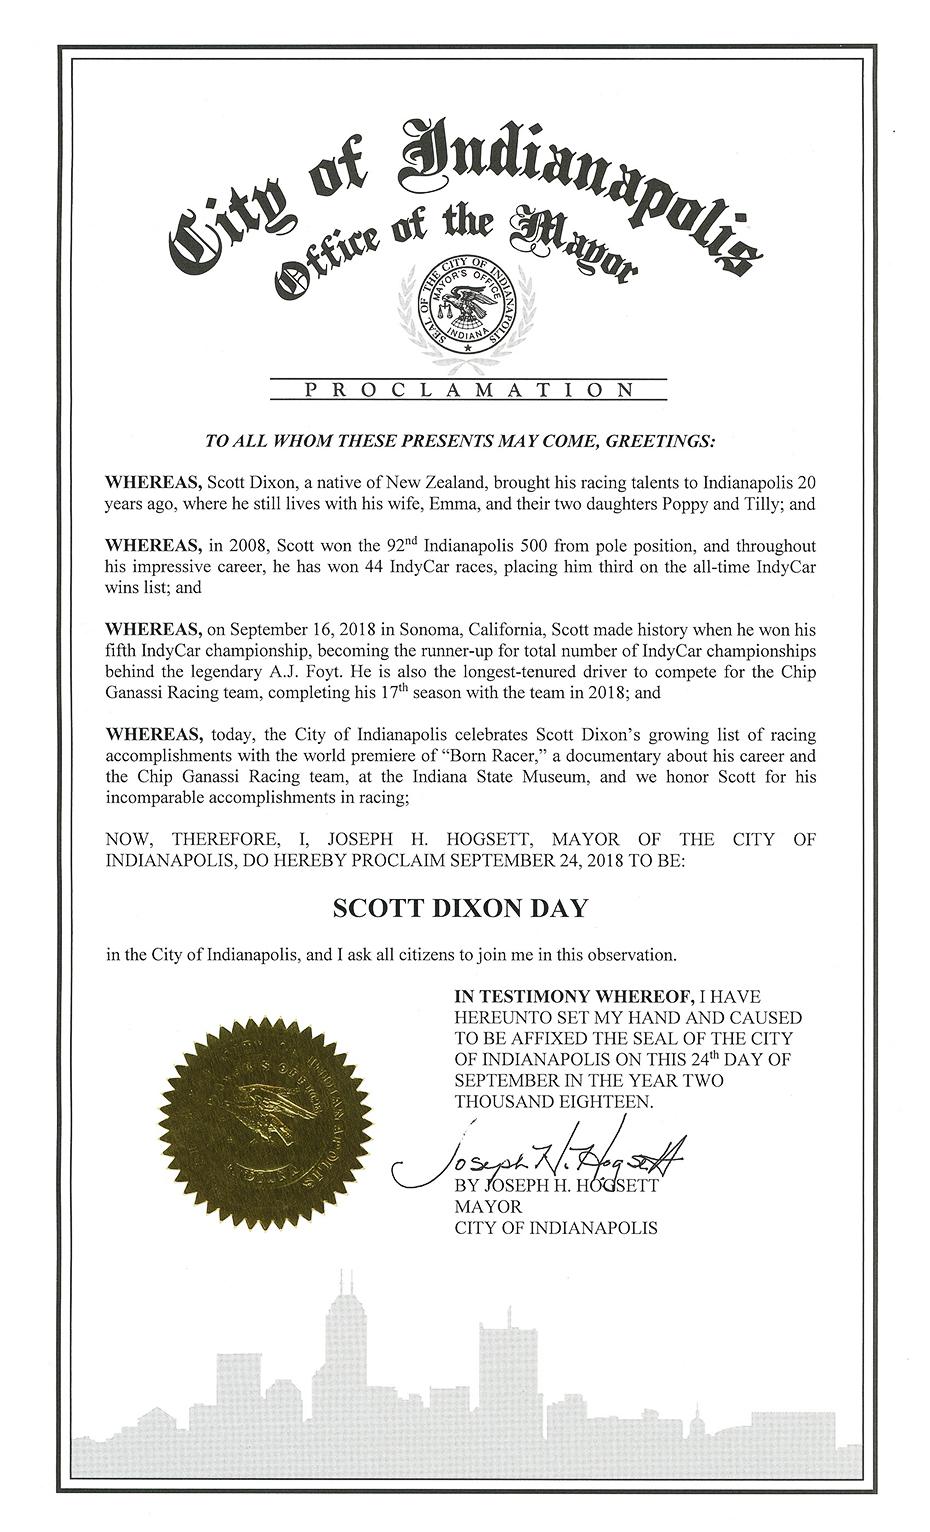 Scott Dixon Day